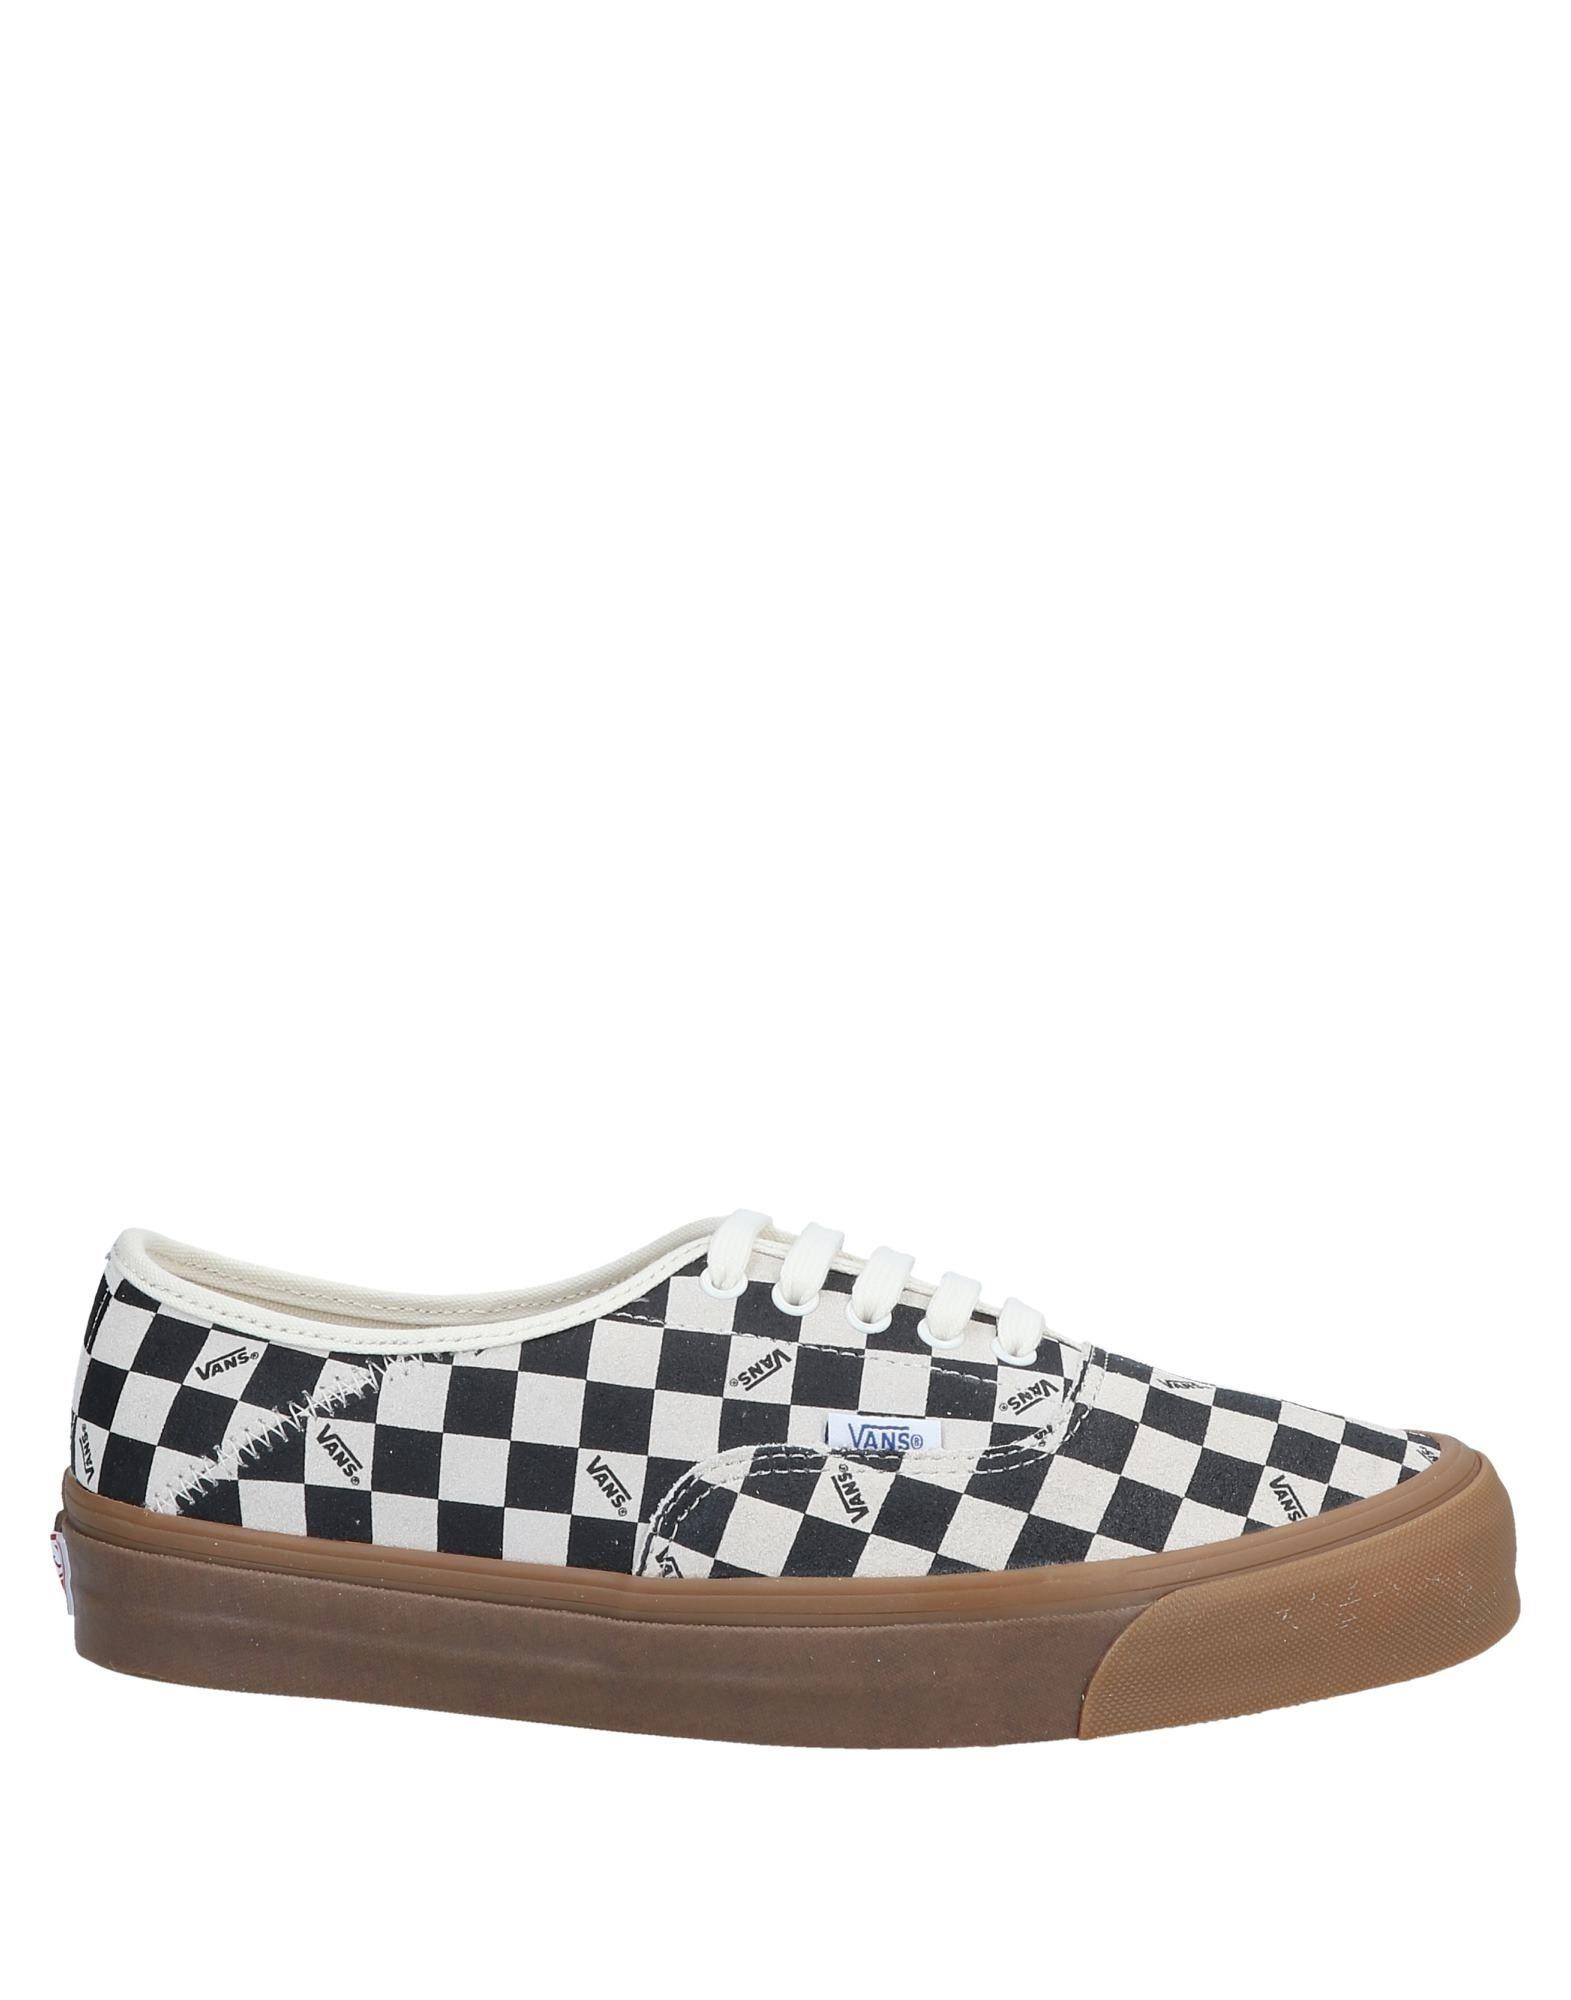 Vans on Sneakers - Men Vans Sneakers online on Vans  Canada - 11573665UM 9fe0bd